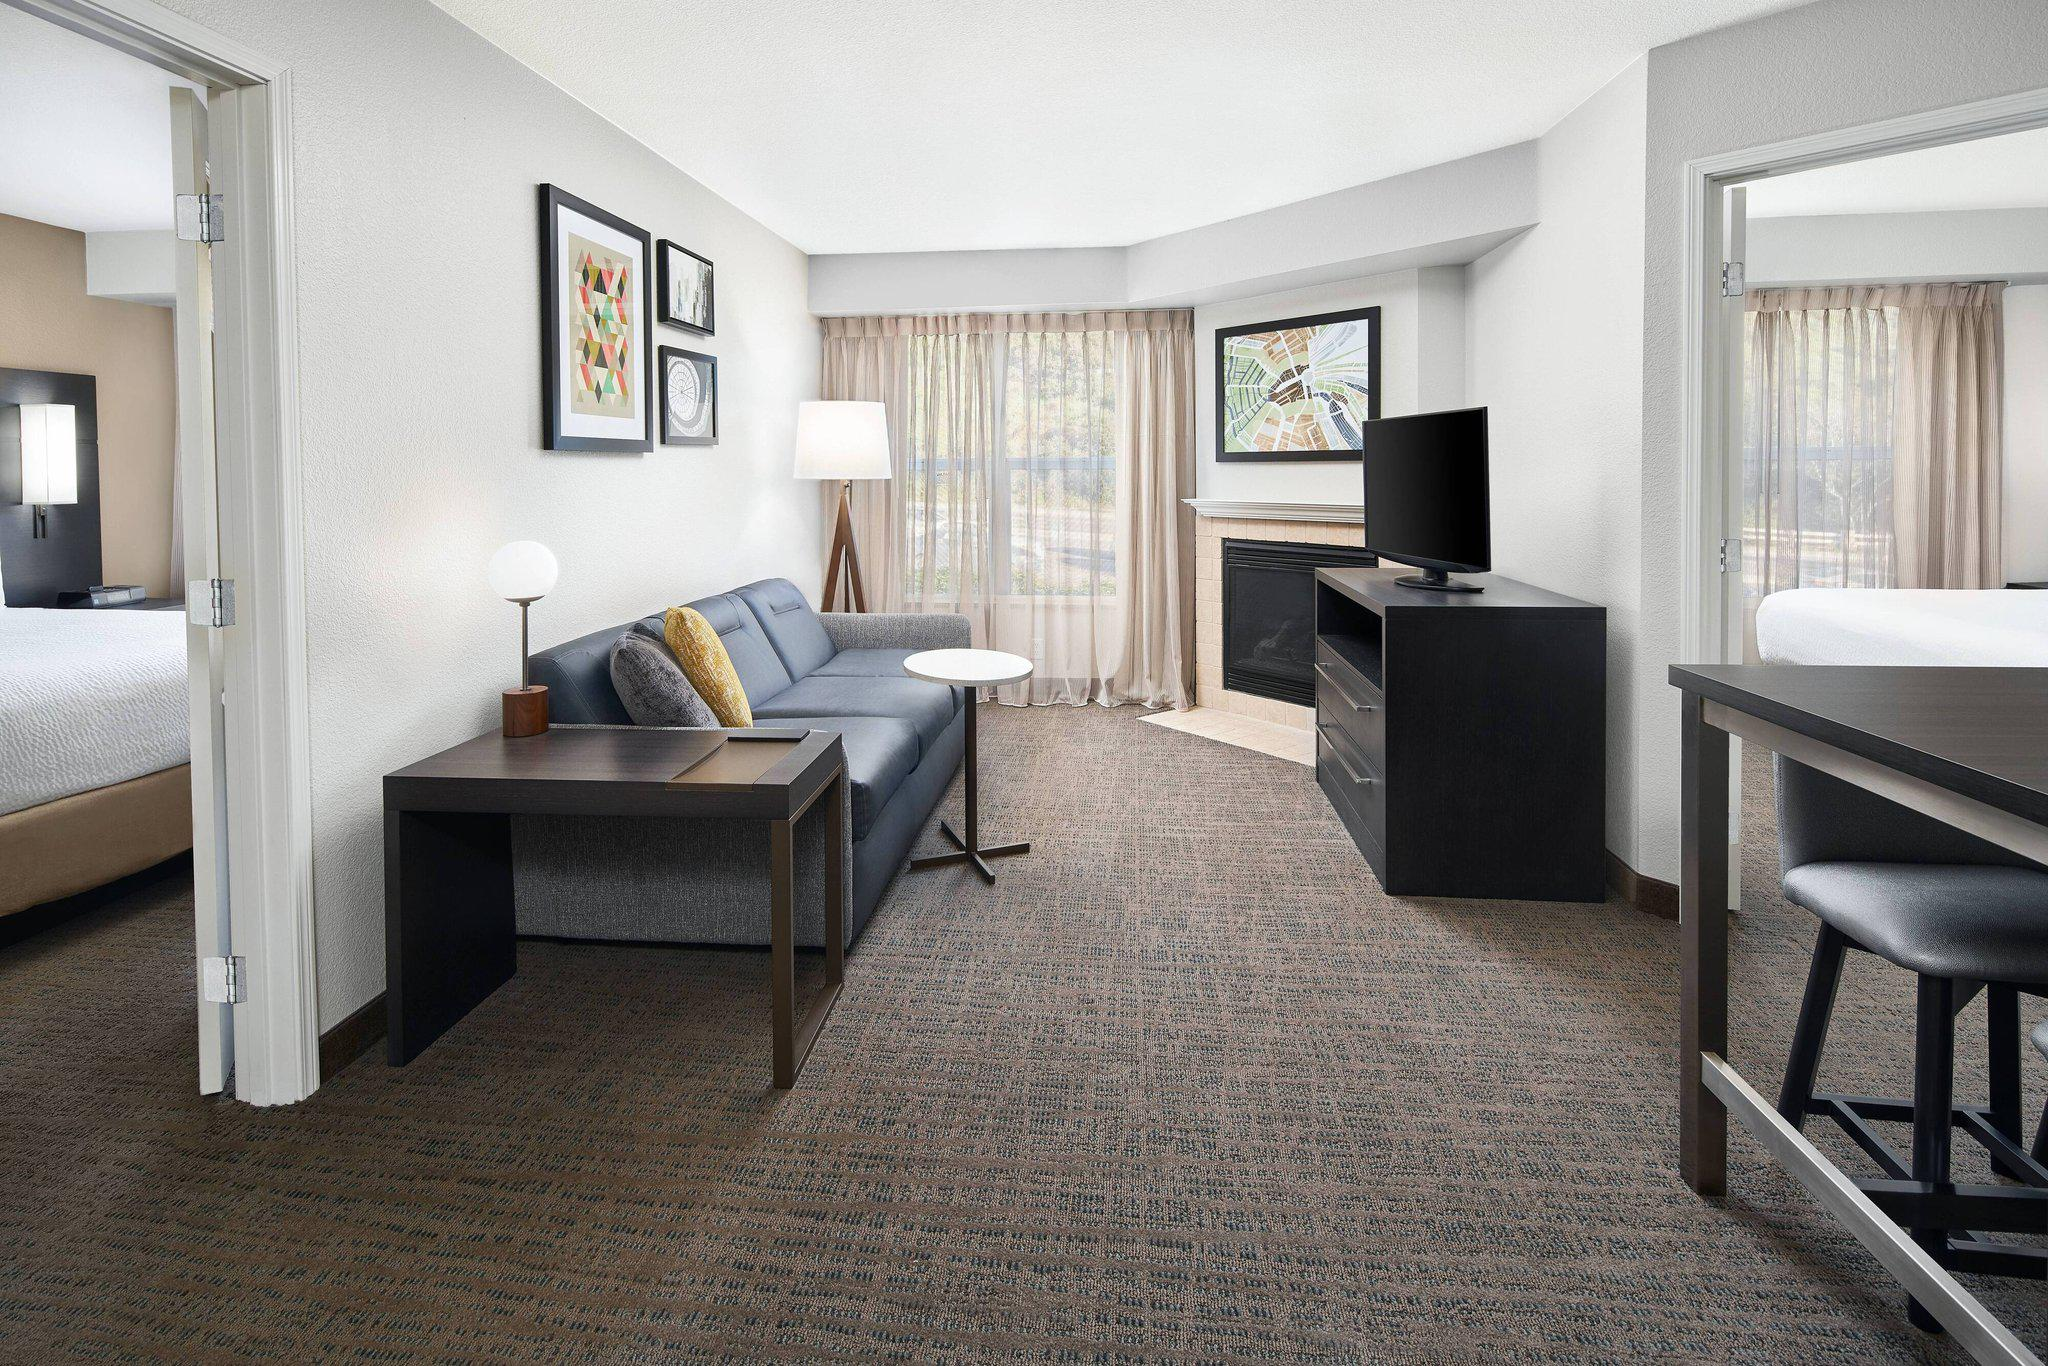 Residence Inn by Marriott San Diego Rancho Bernardo/Scripps Poway